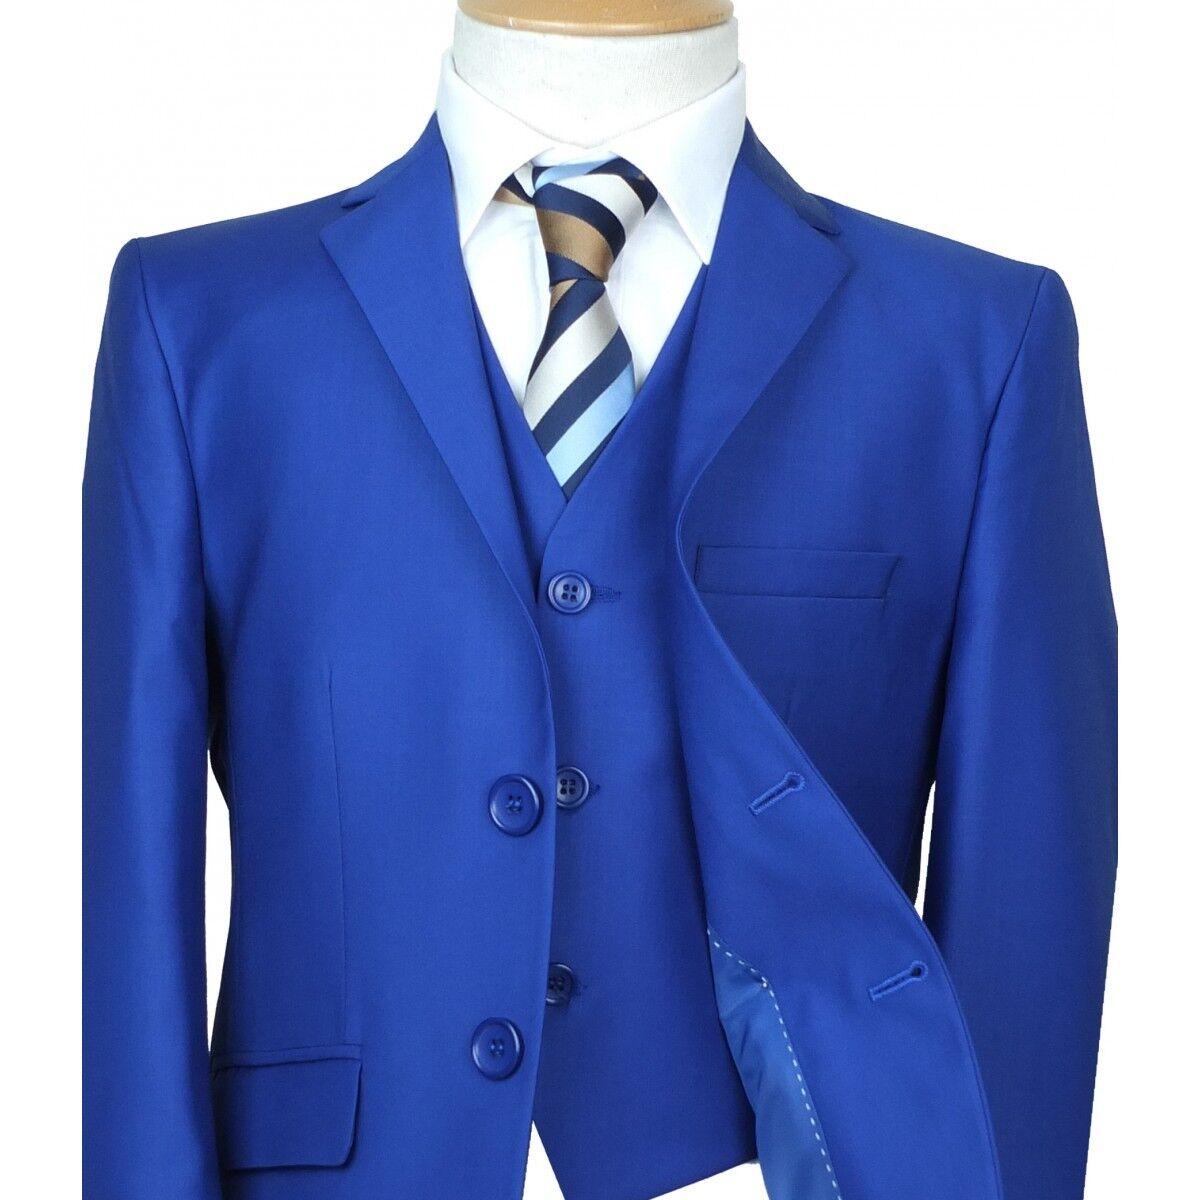 Royal Blue Boys Suit Italian Cut Pageboy Wedding Suits